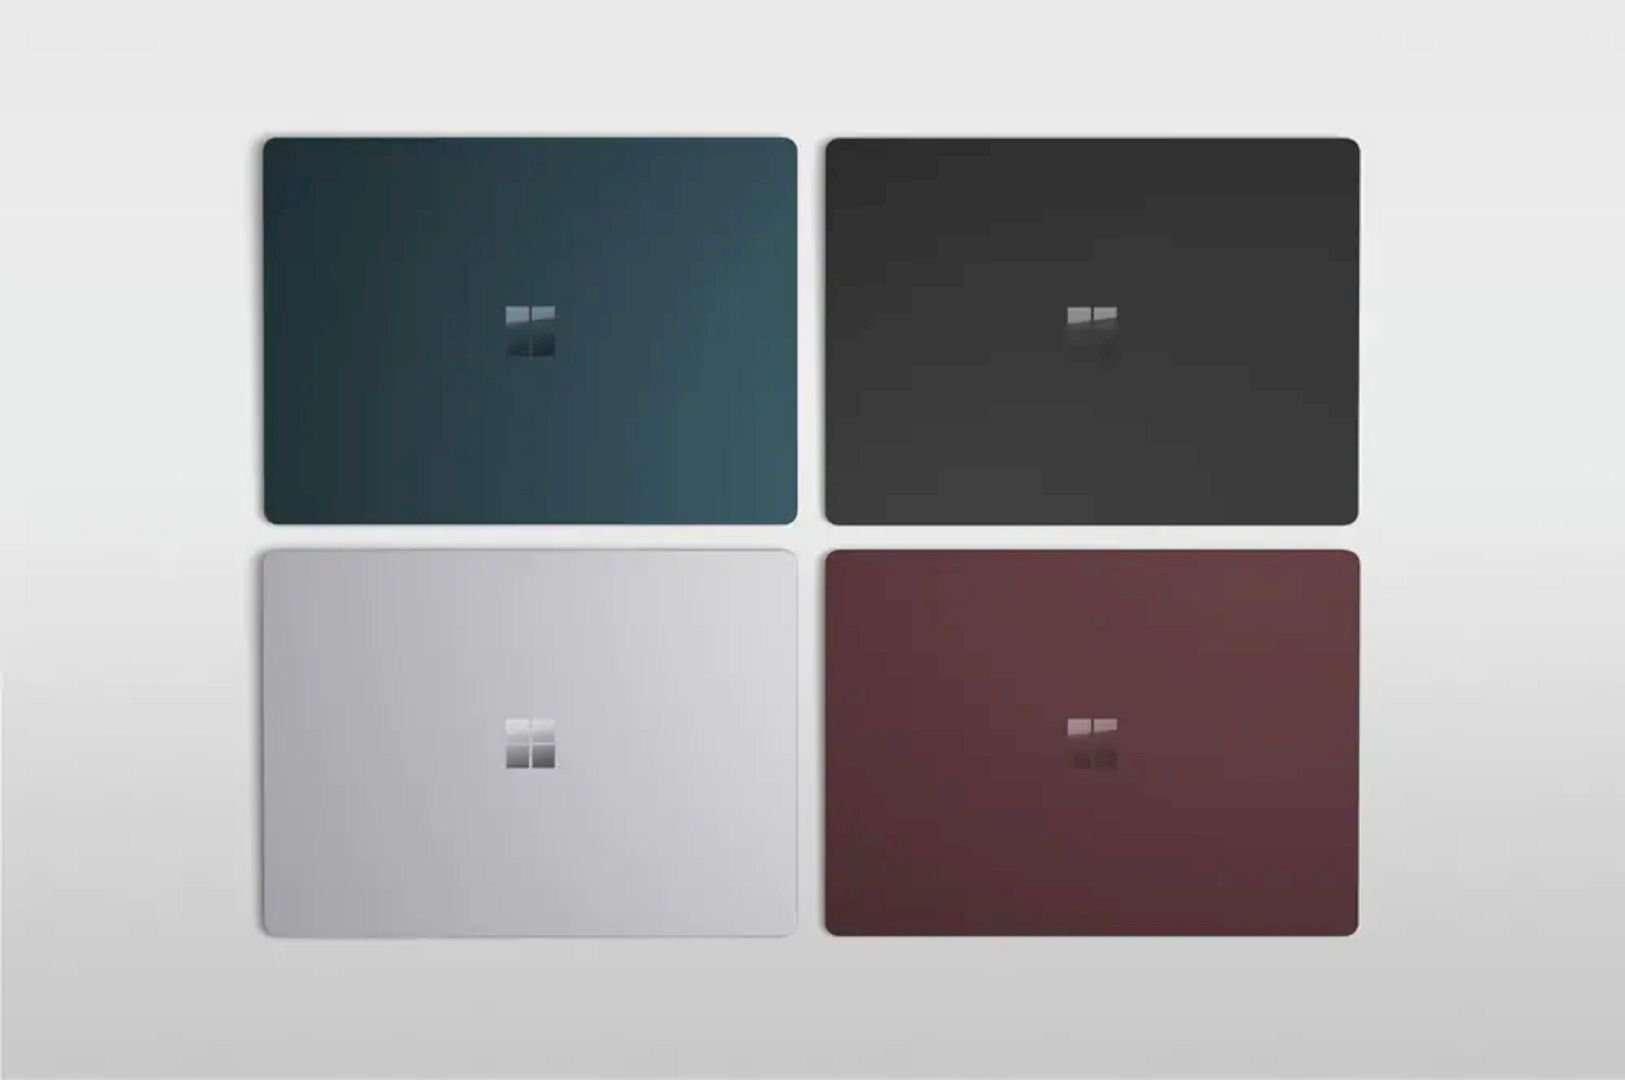 Surface Laptop 2 5